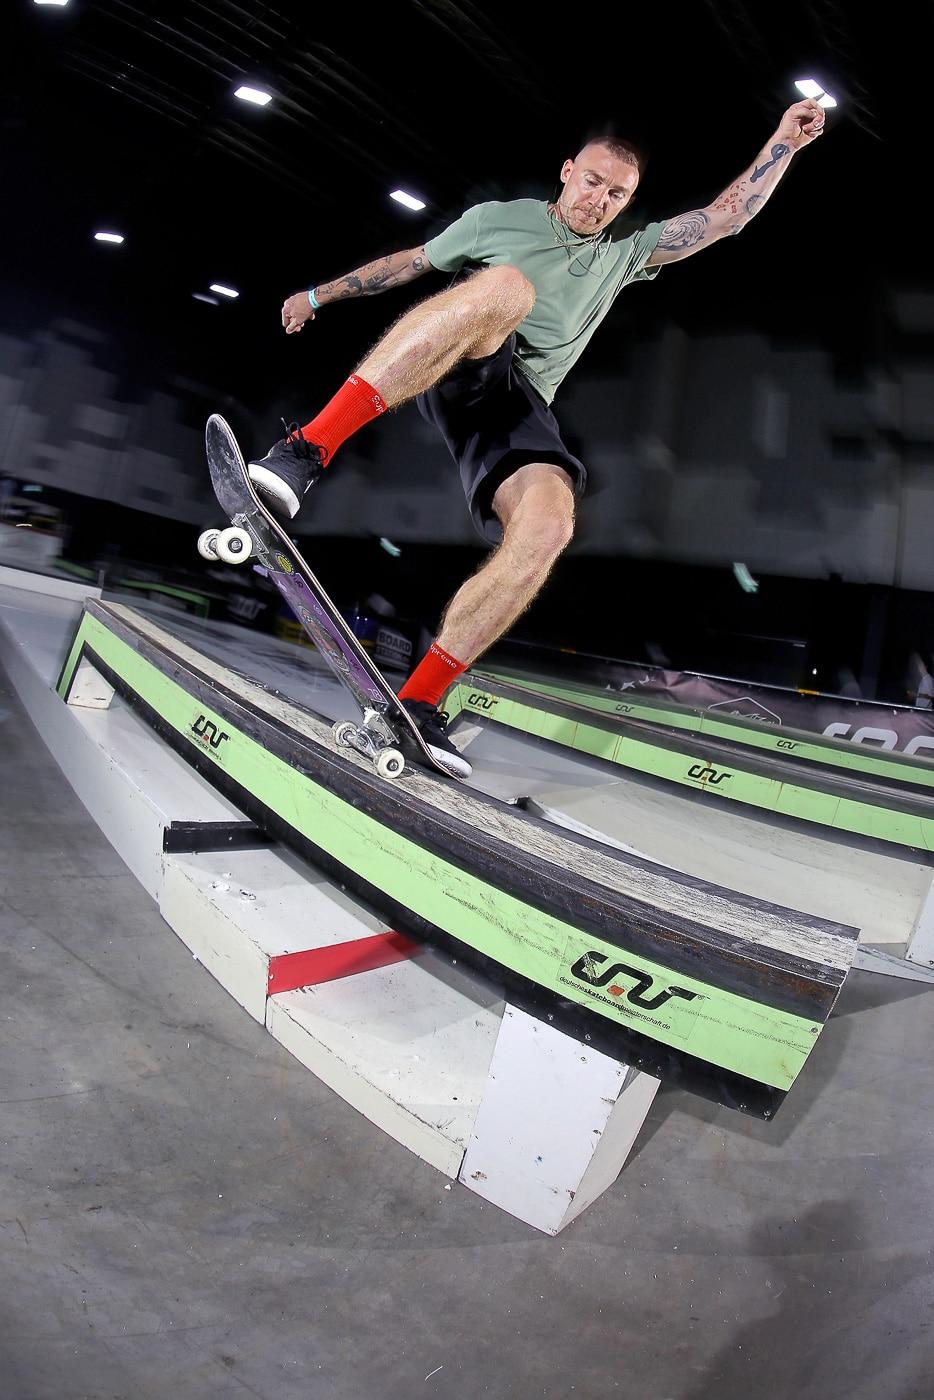 Club-of-skaters-cos-europapark-Thomas-Gentsch-photo-irregularskatemag-12